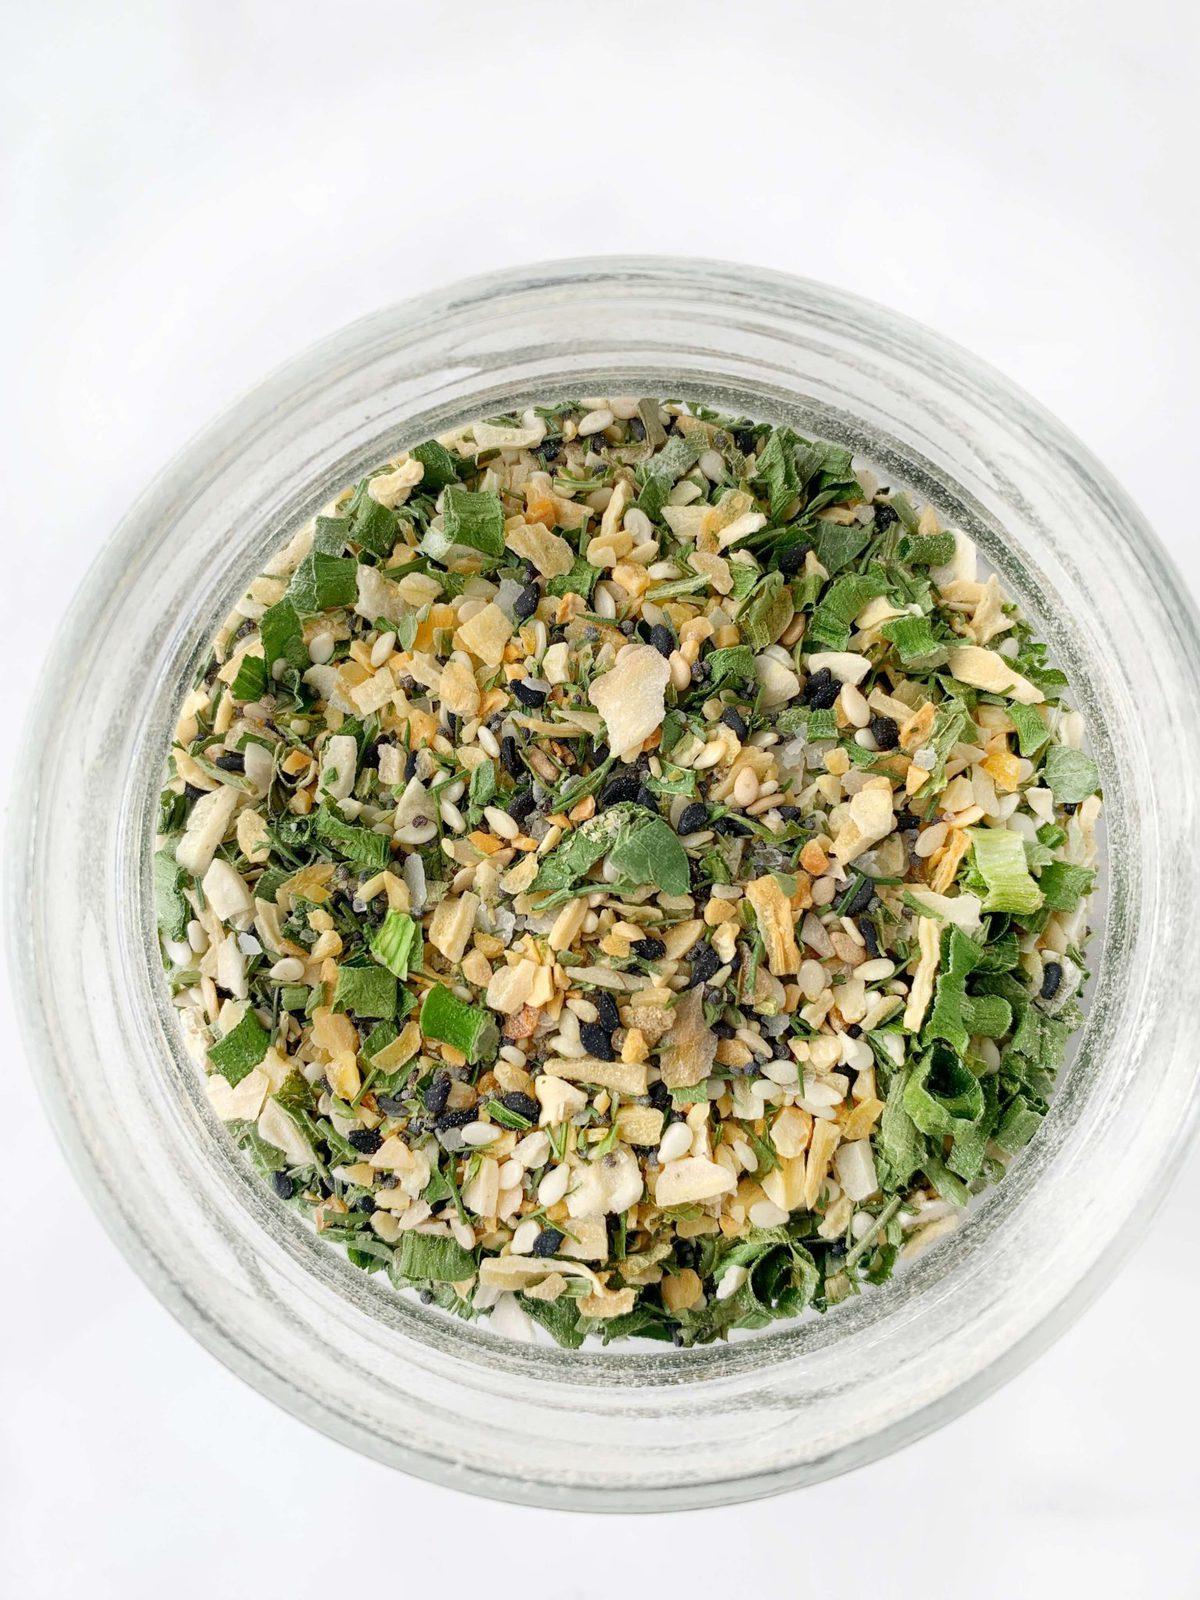 Overhead shot of an herbed seasoning mix in a mason jar